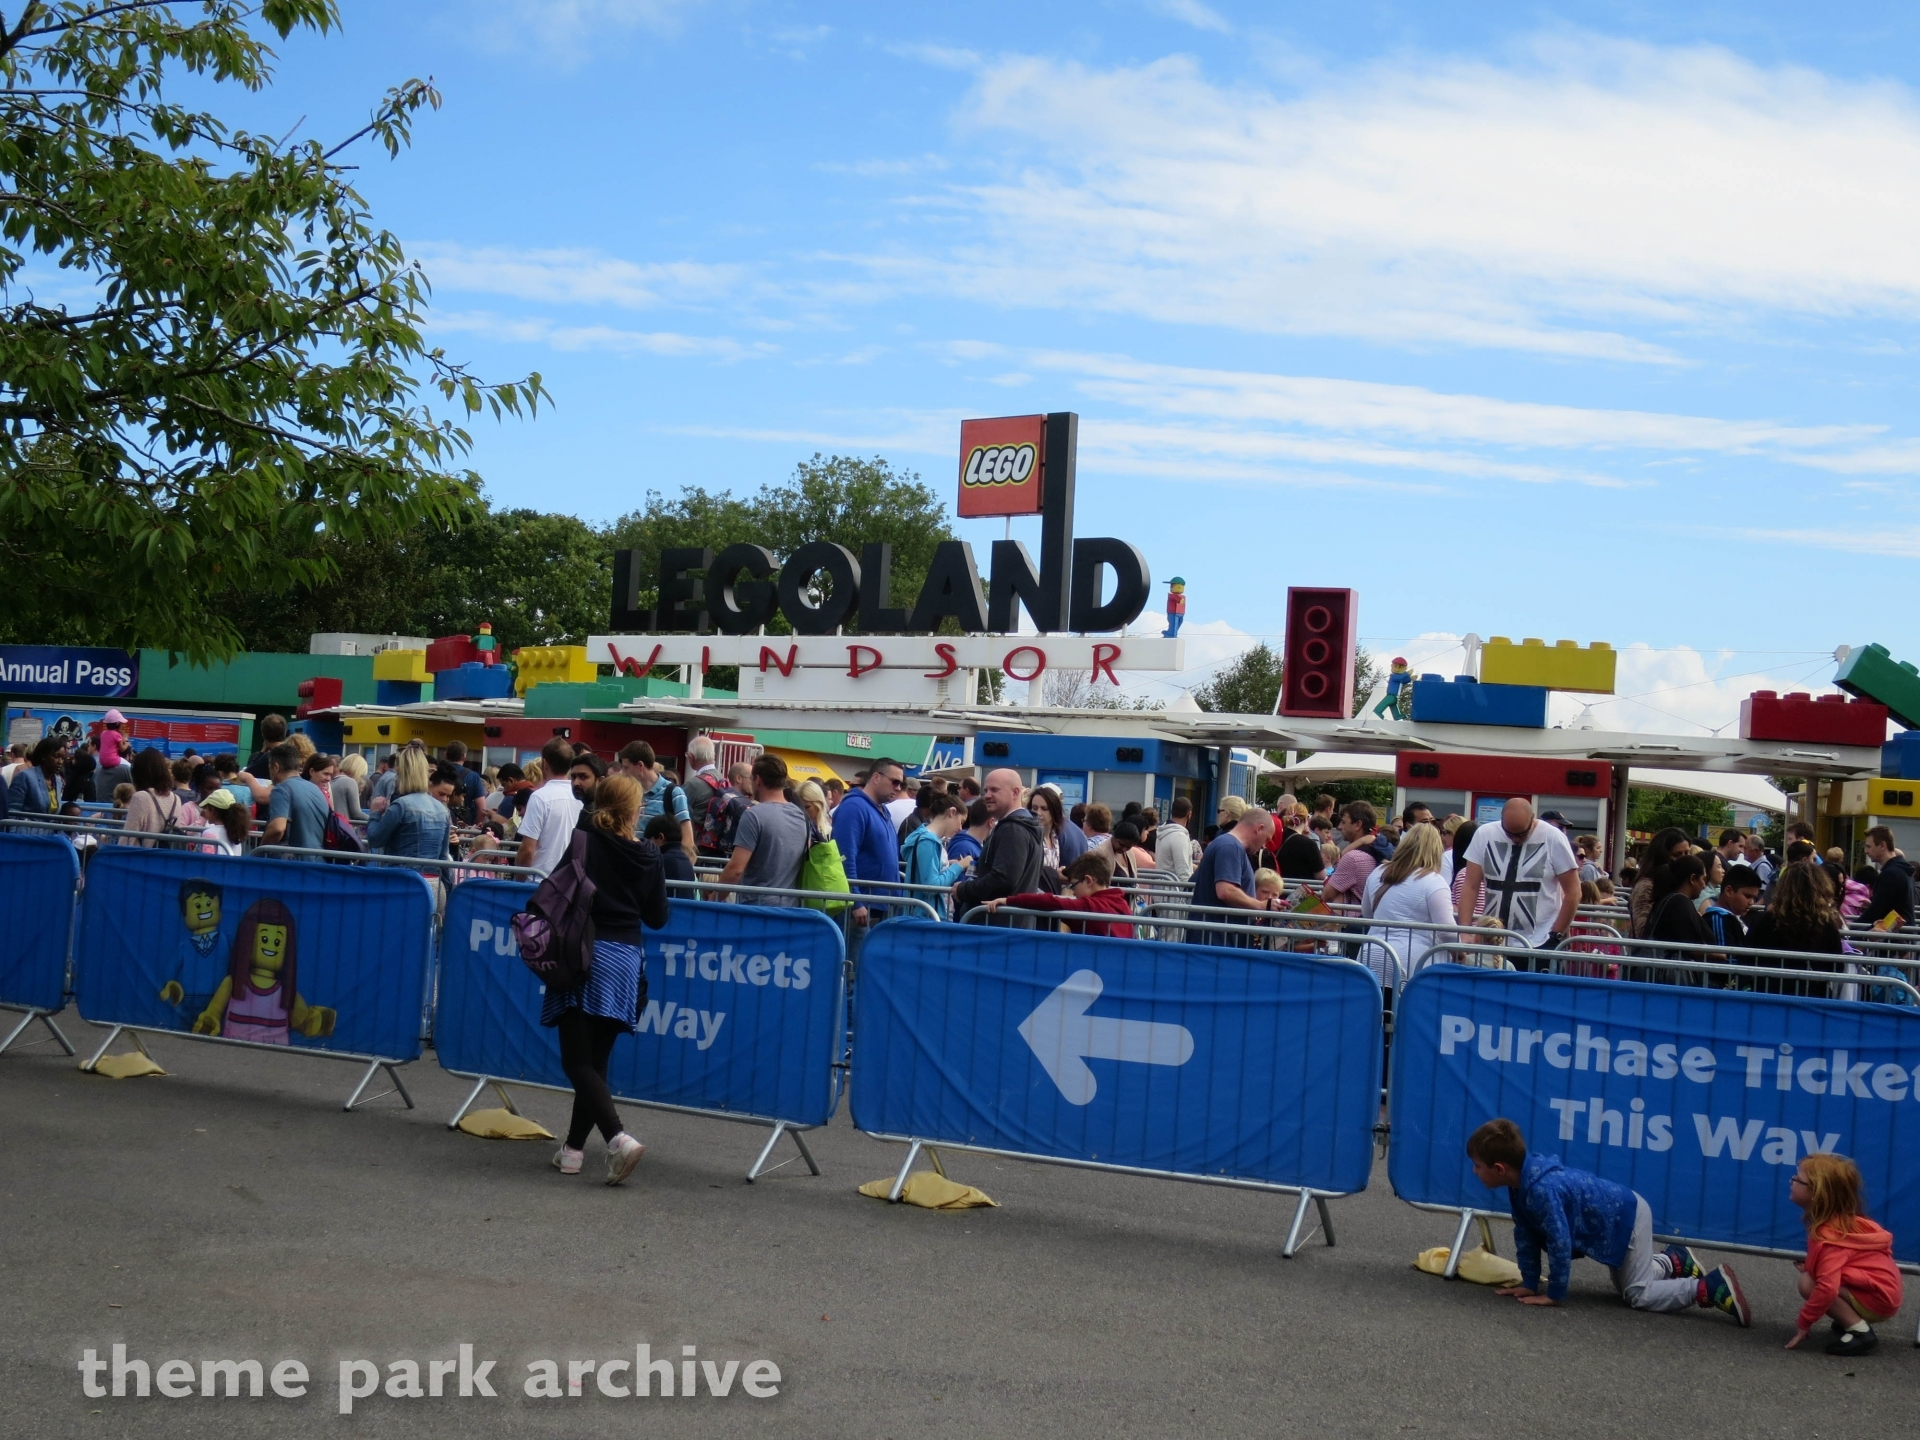 The Beginning at LEGOLAND Windsor